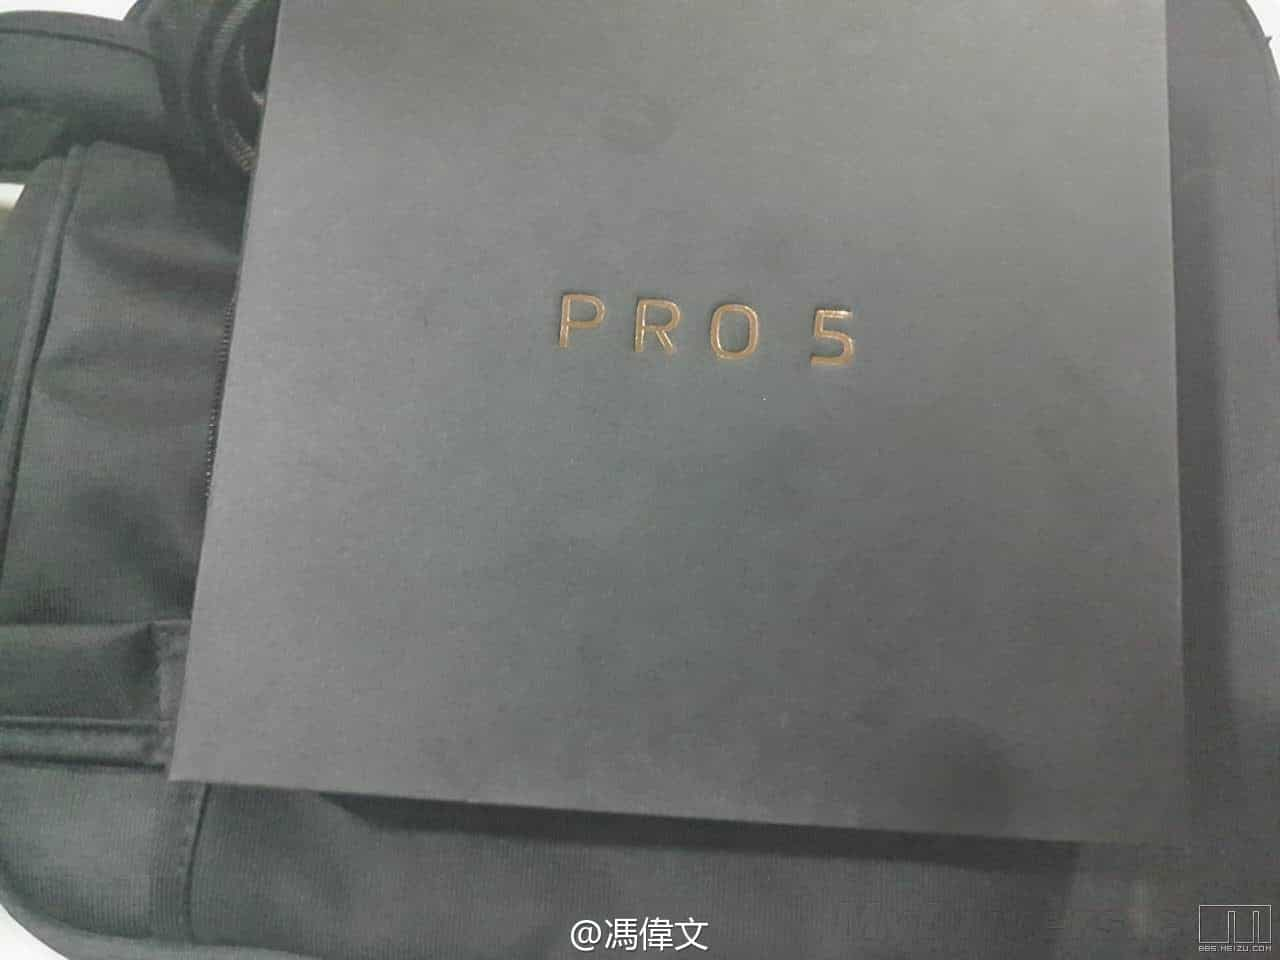 Meizu Pro 5 retail packaging leak 4